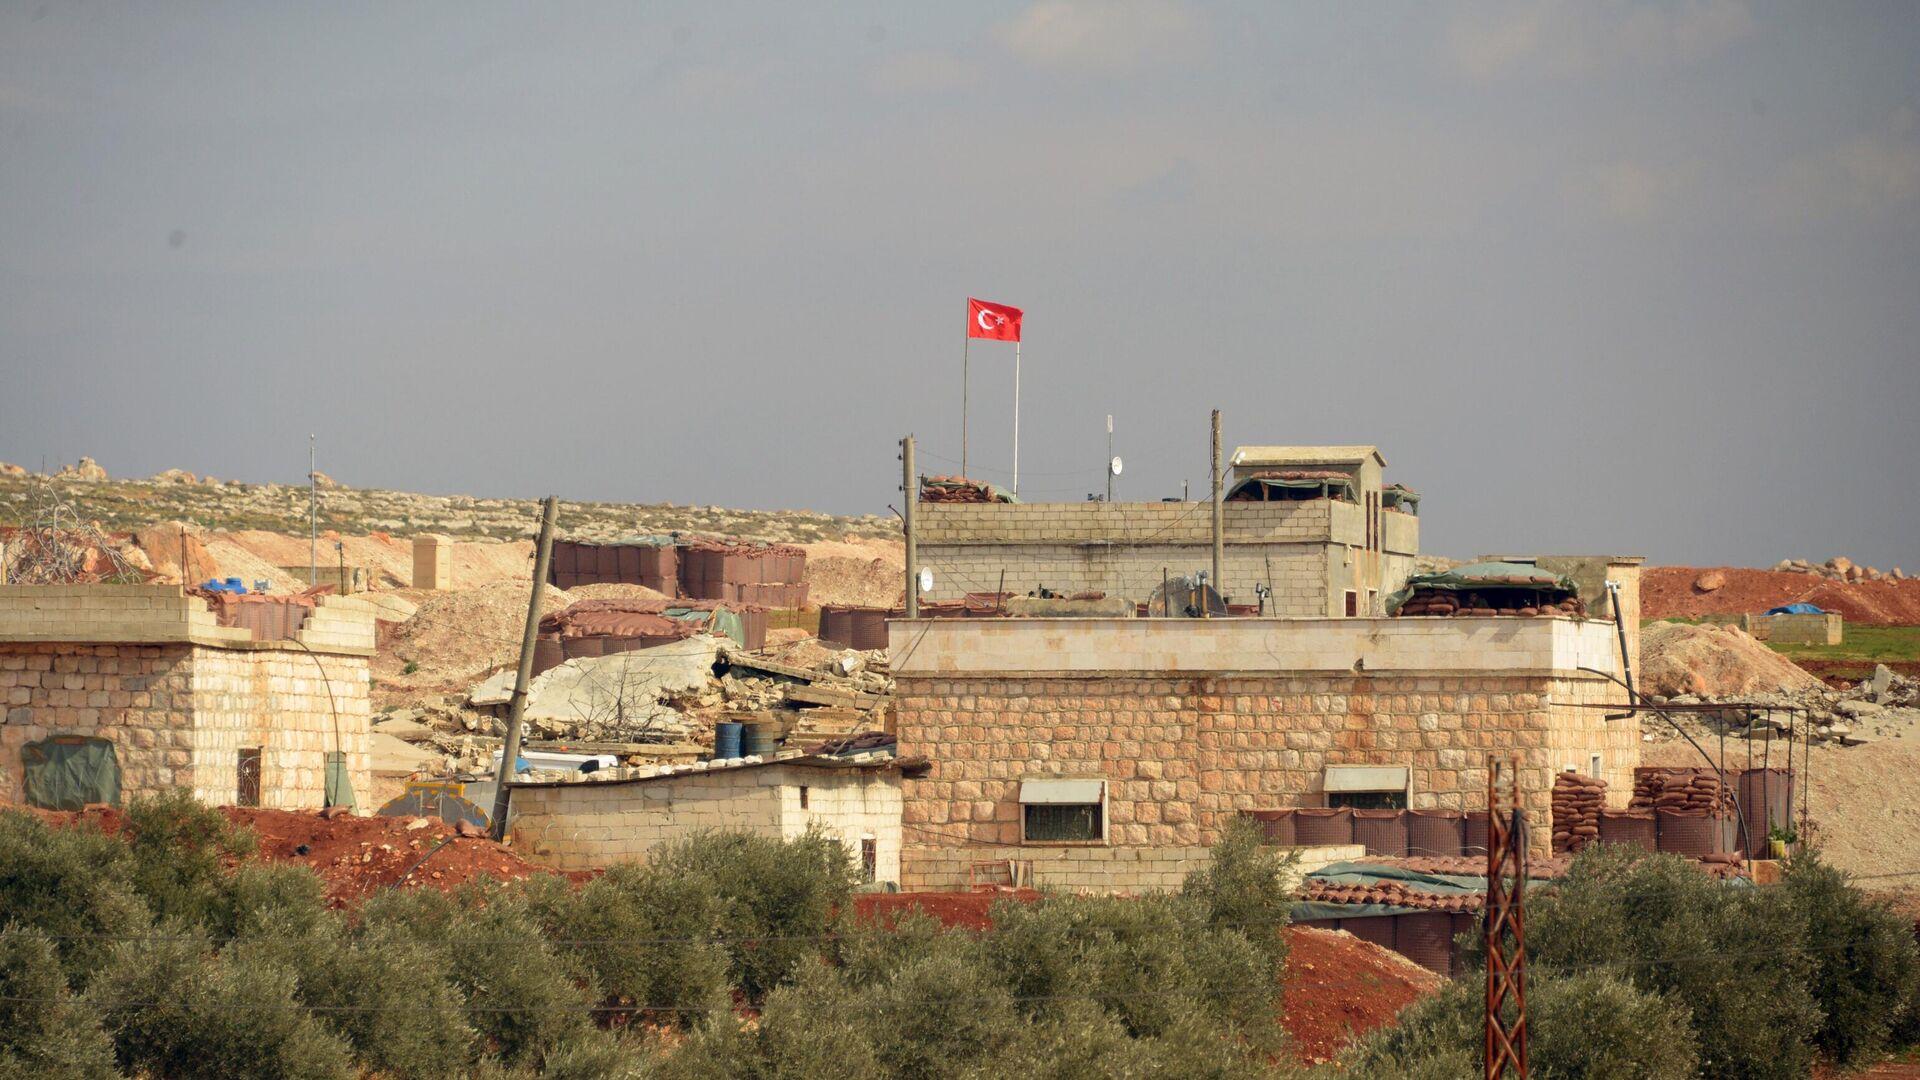 Турецкий пост наблюдения на границе с Сирией в окрестностях сирийского города Мааррат-эн-Нууман - РИА Новости, 1920, 01.09.2020